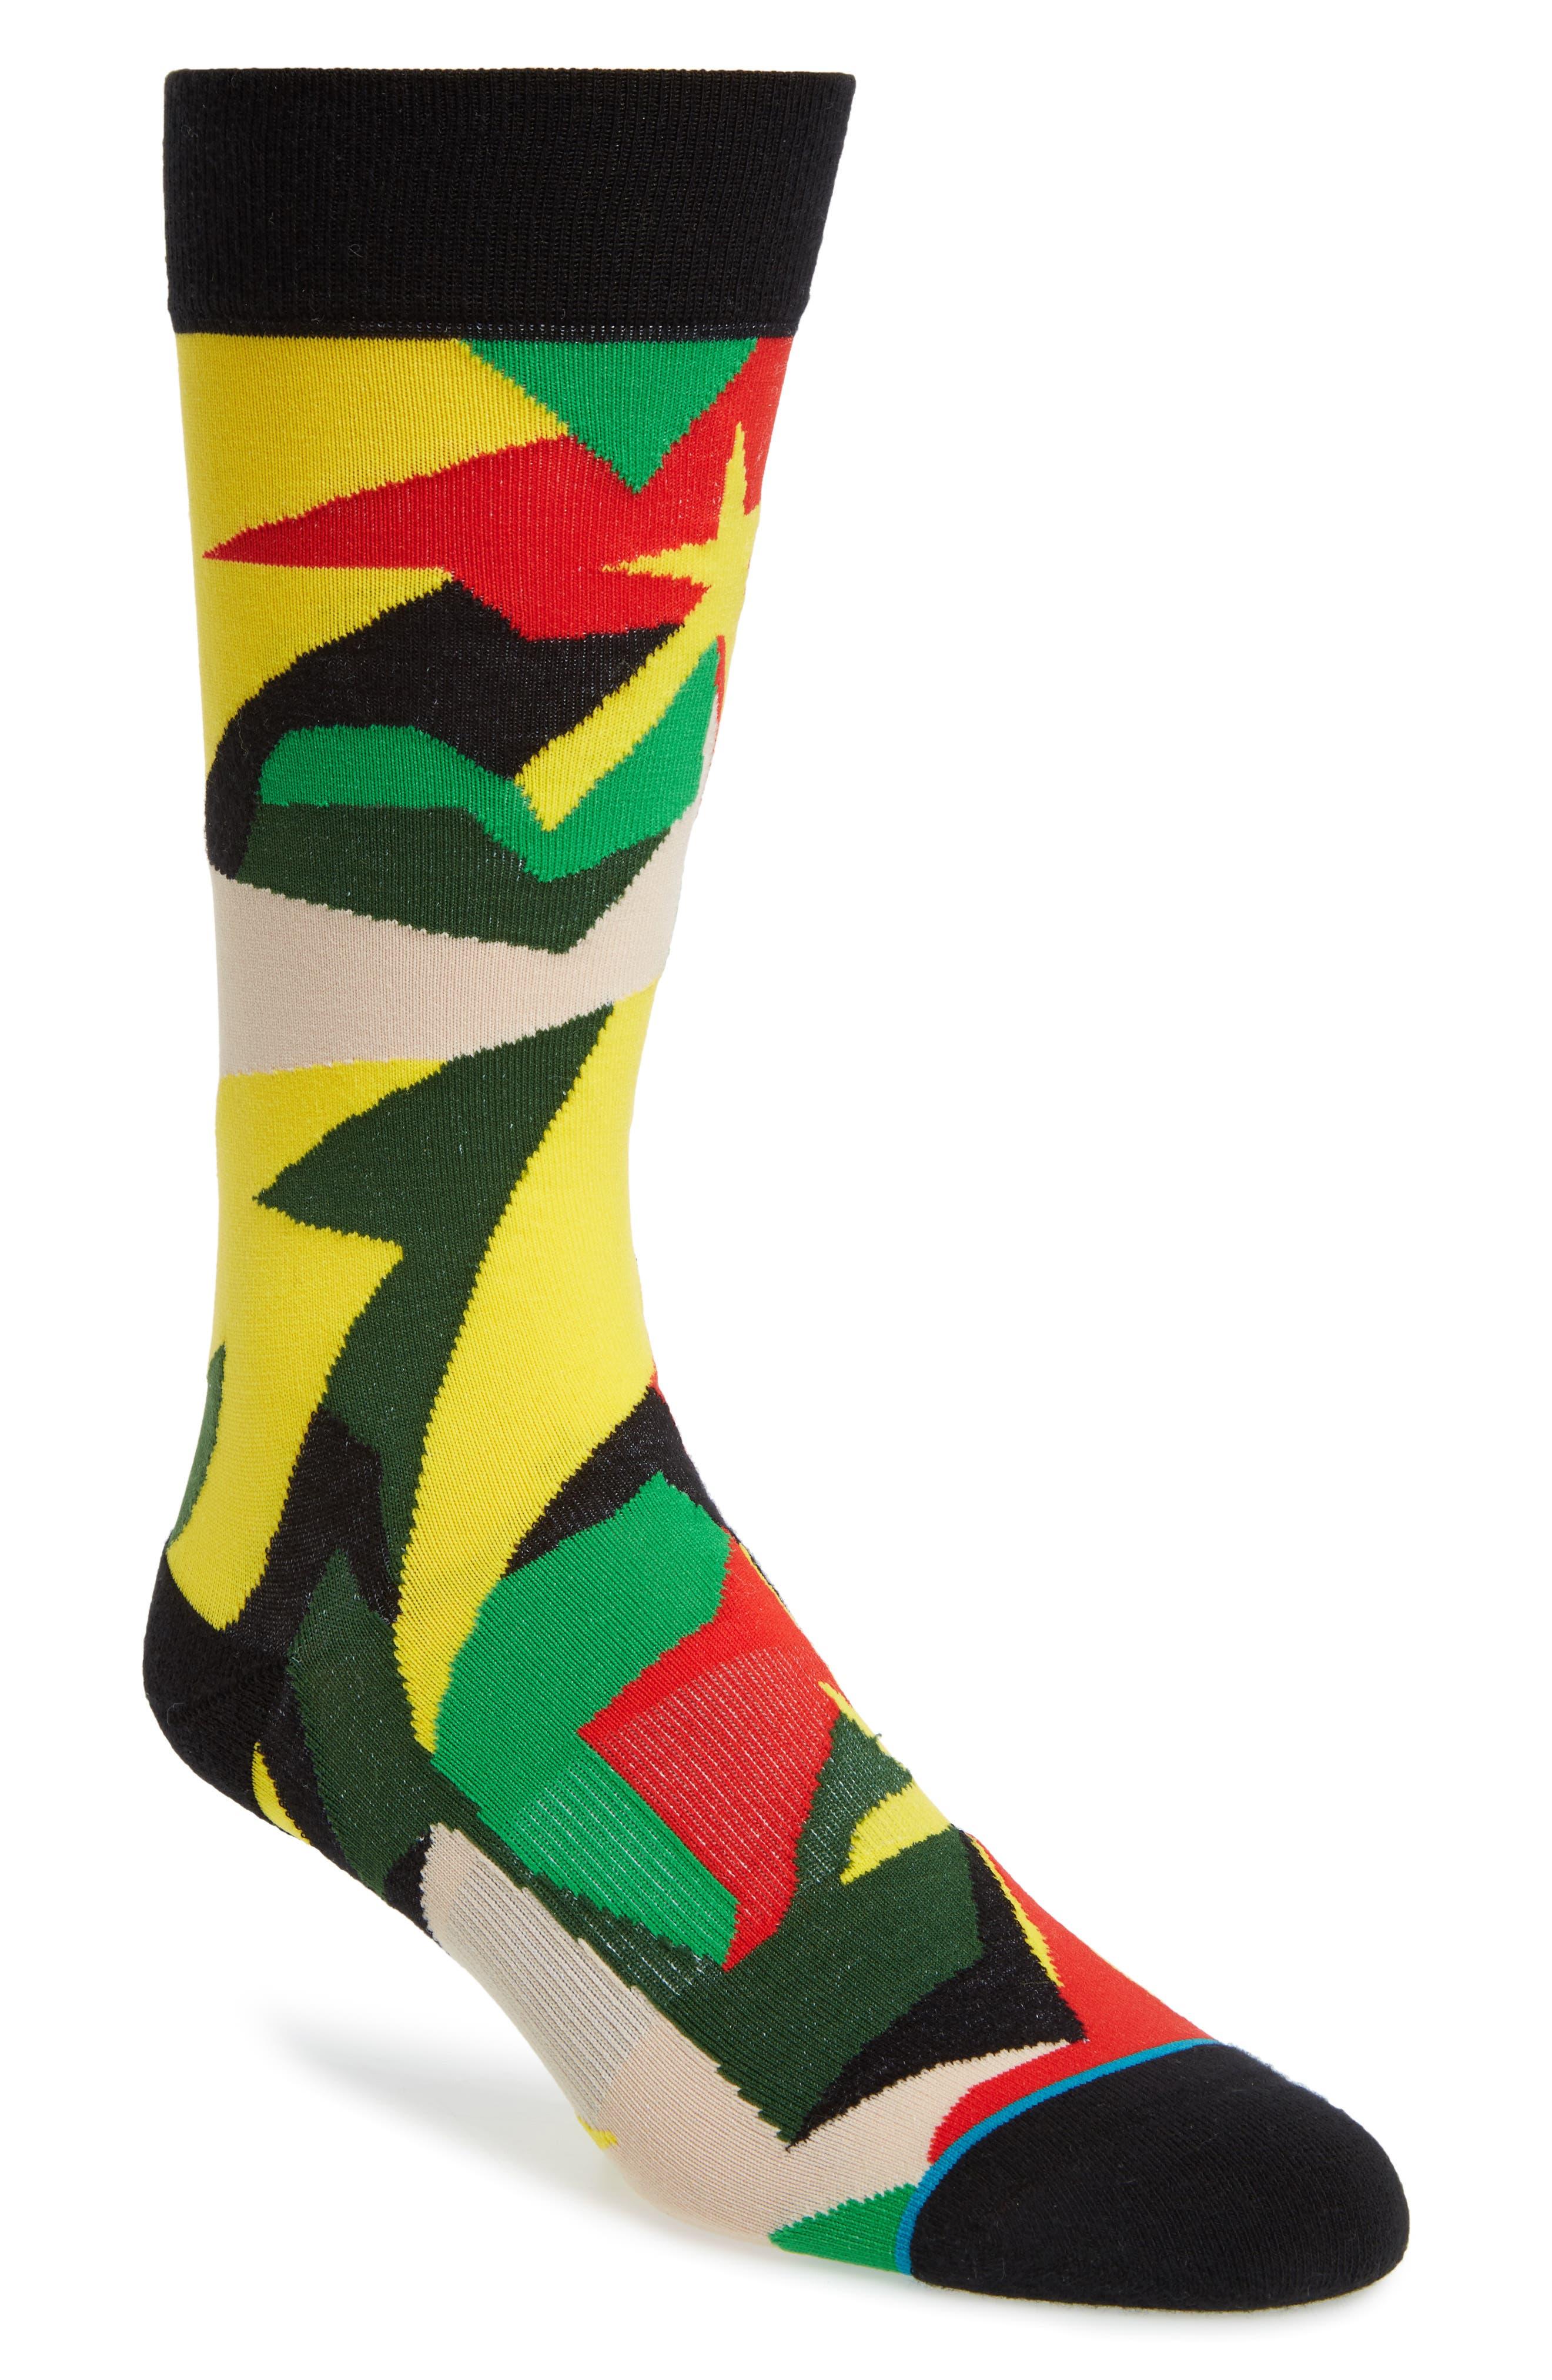 Regulator Socks,                             Main thumbnail 1, color,                             Green